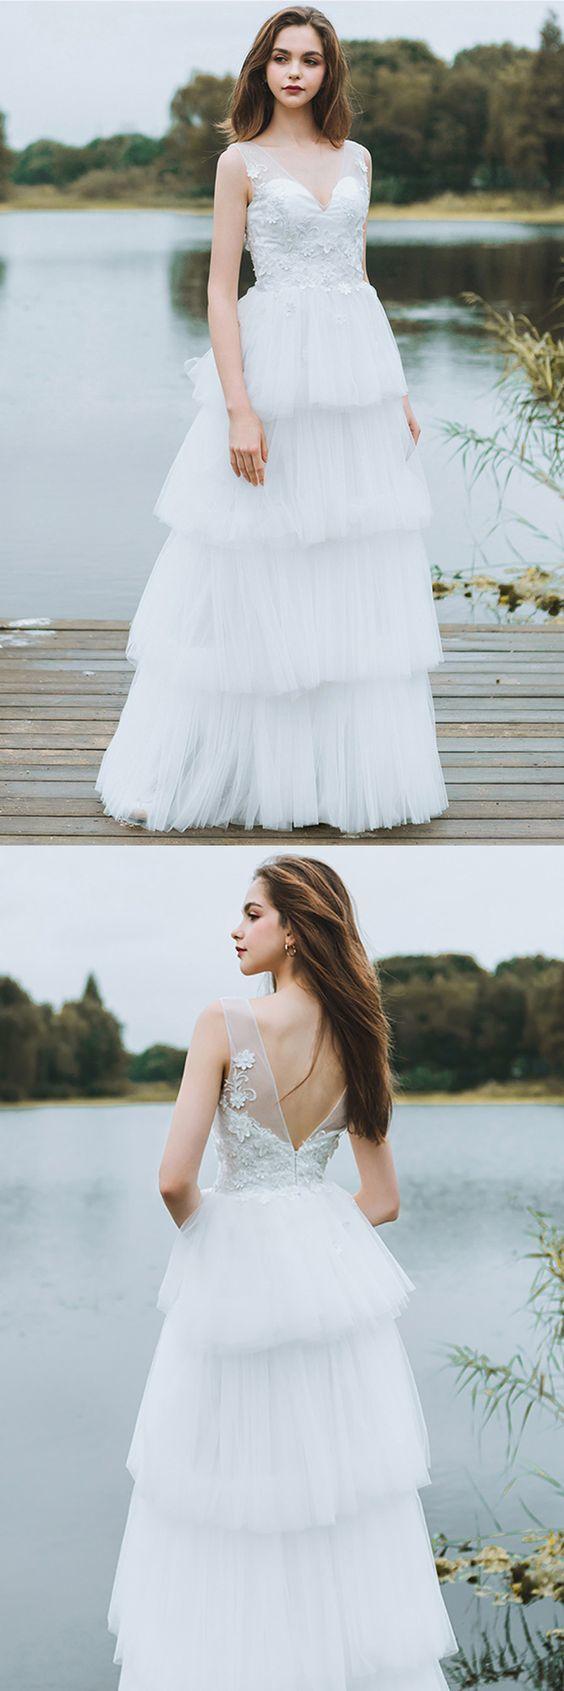 Unique Tiered Tulle Low Back Boho Wedding Dress Beach Weddings Long Dress